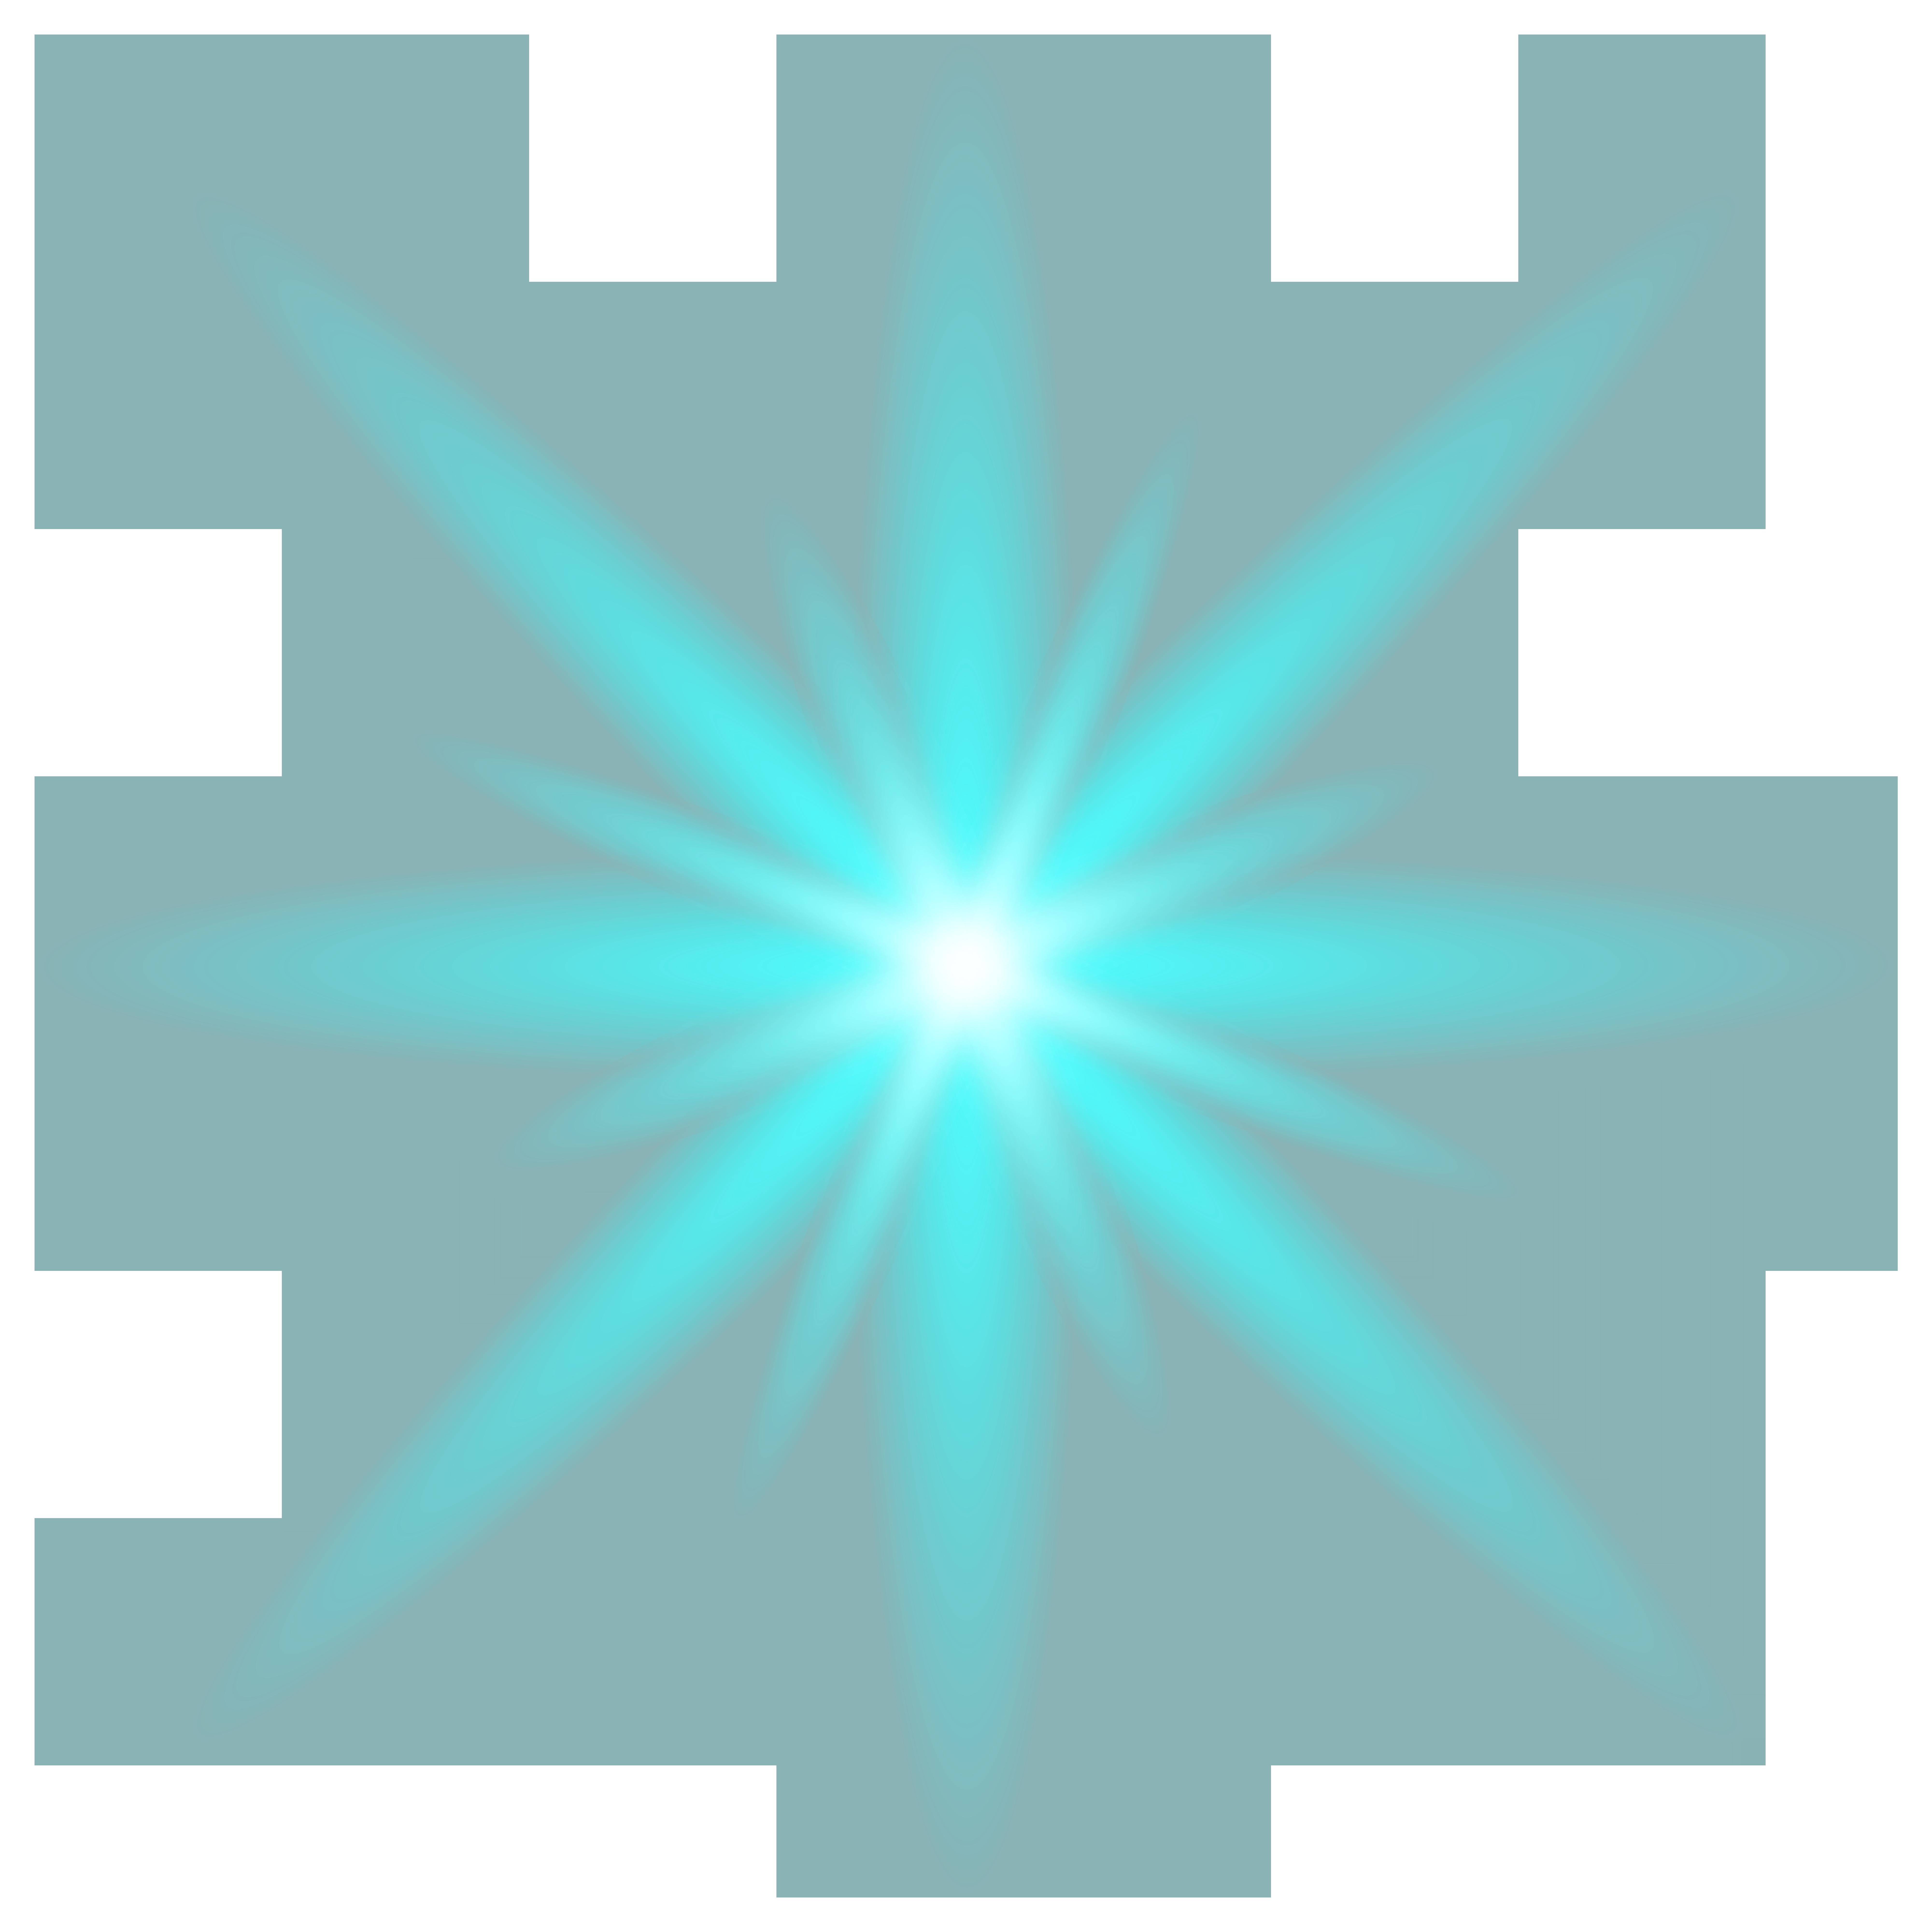 Blue Light Effect PNG Clip Art Image.